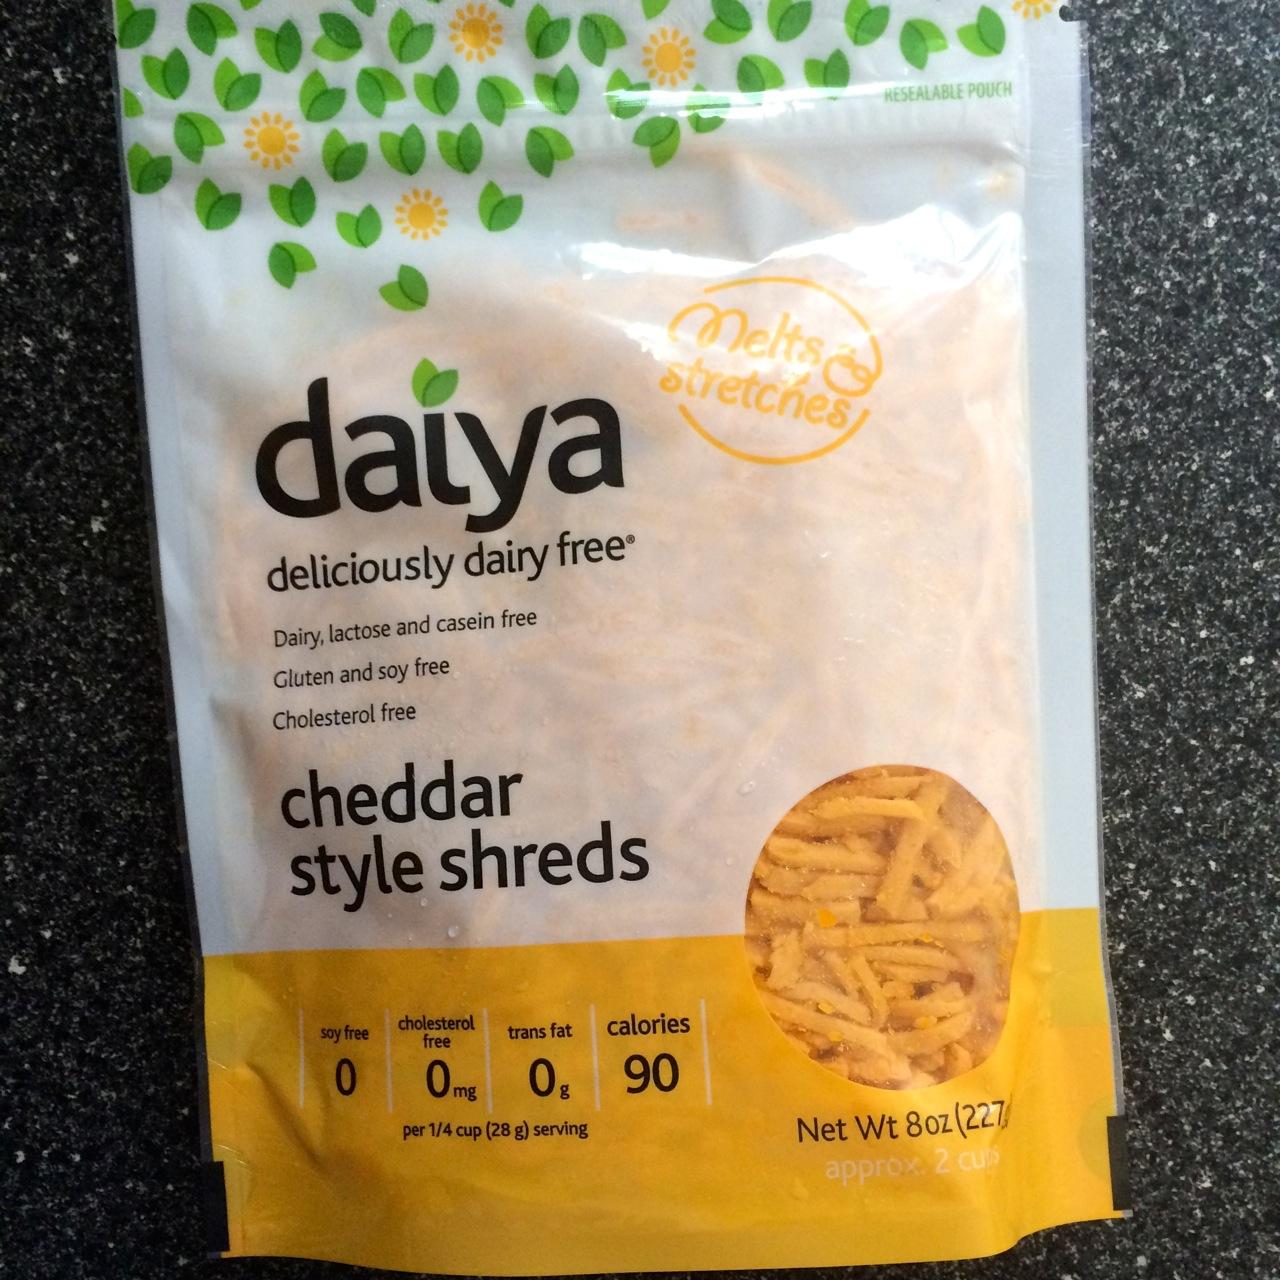 https://i0.wp.com/fatgayvegan.com/wp-content/uploads/2015/06/daiya-cheddar-style-shreds-bag.jpg?fit=1280%2C1280